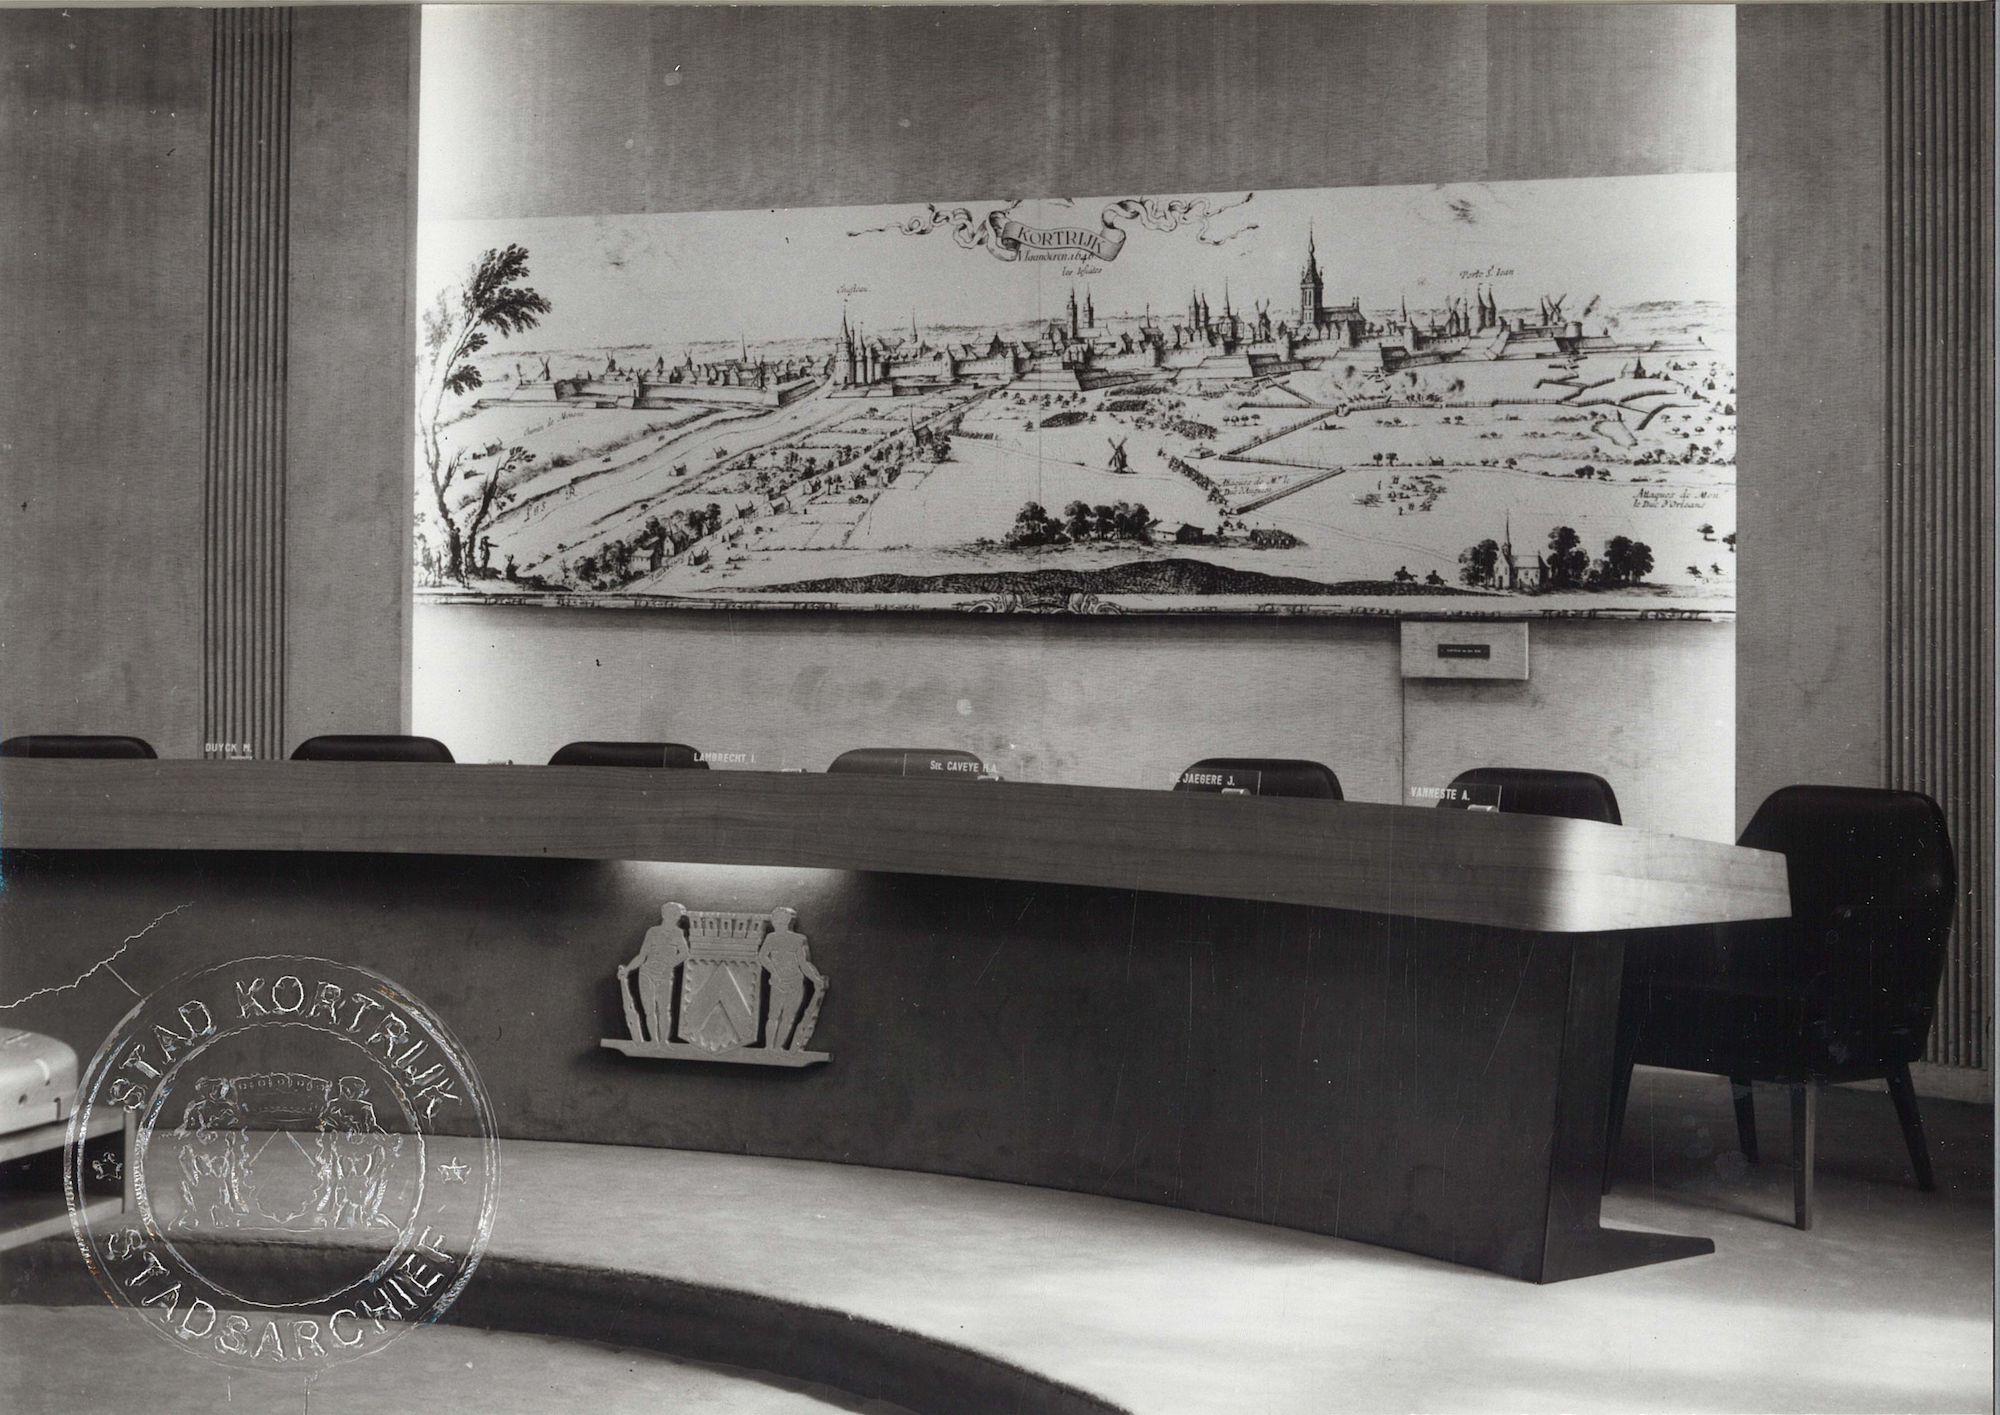 Raadzaal Kortrijkse stadhuis